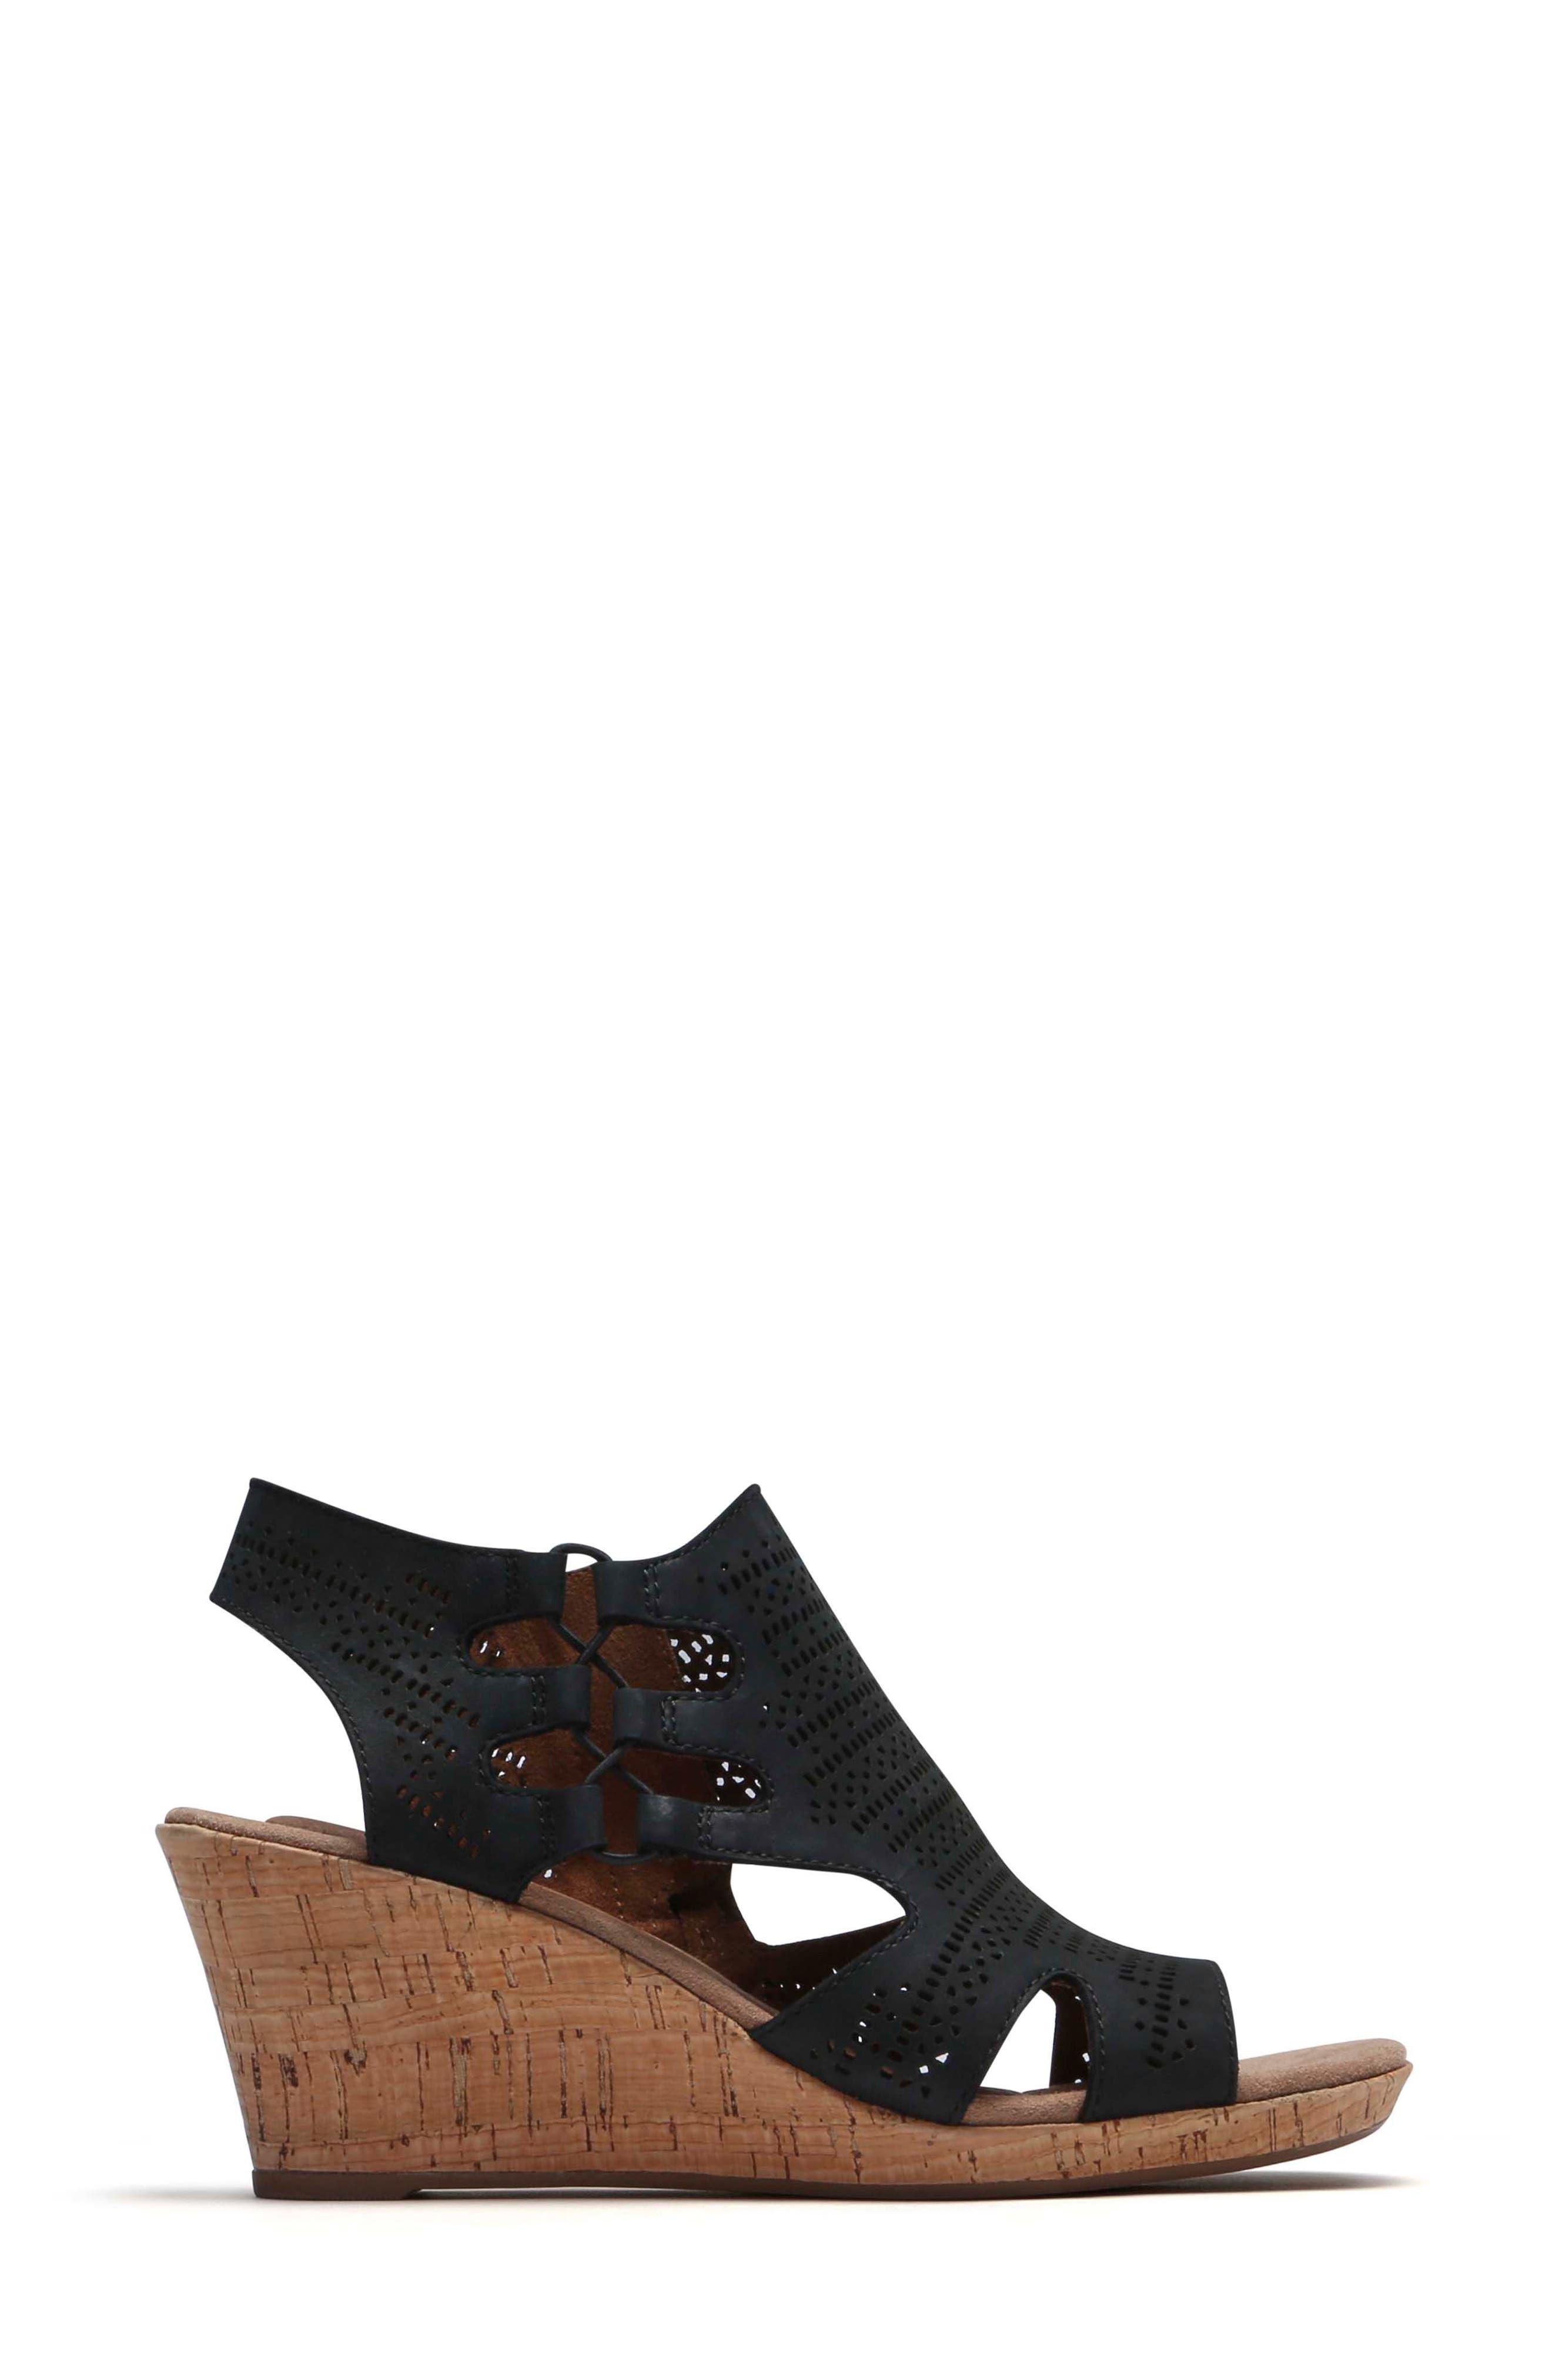 Janna Perforated Wedge Sandal,                             Alternate thumbnail 3, color,                             BLACK NUBUCK LEATHER